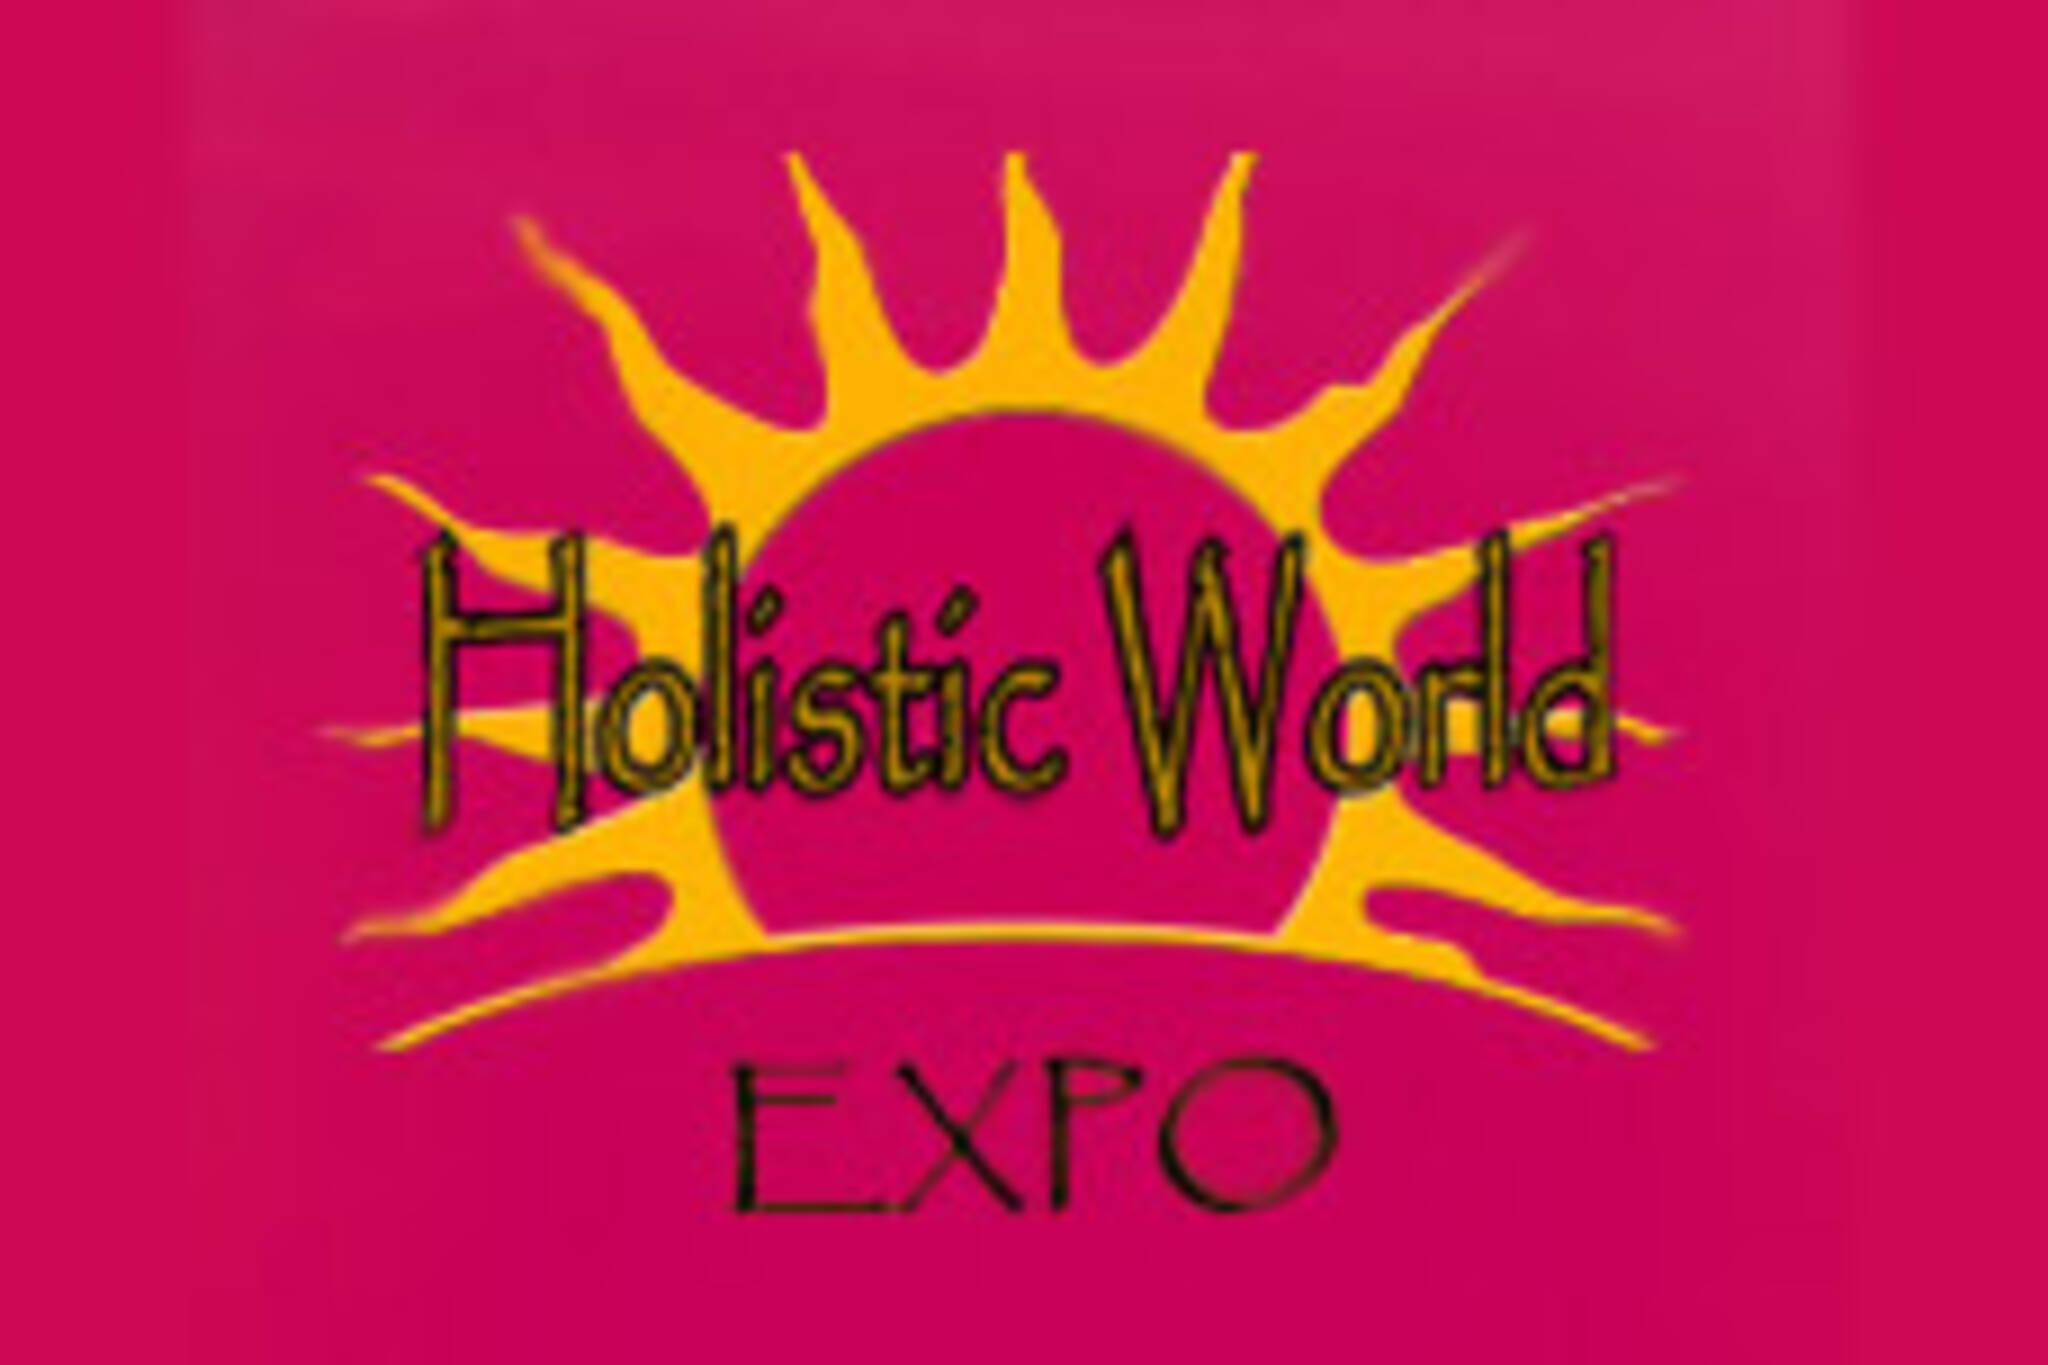 20070314_holistic.jpg